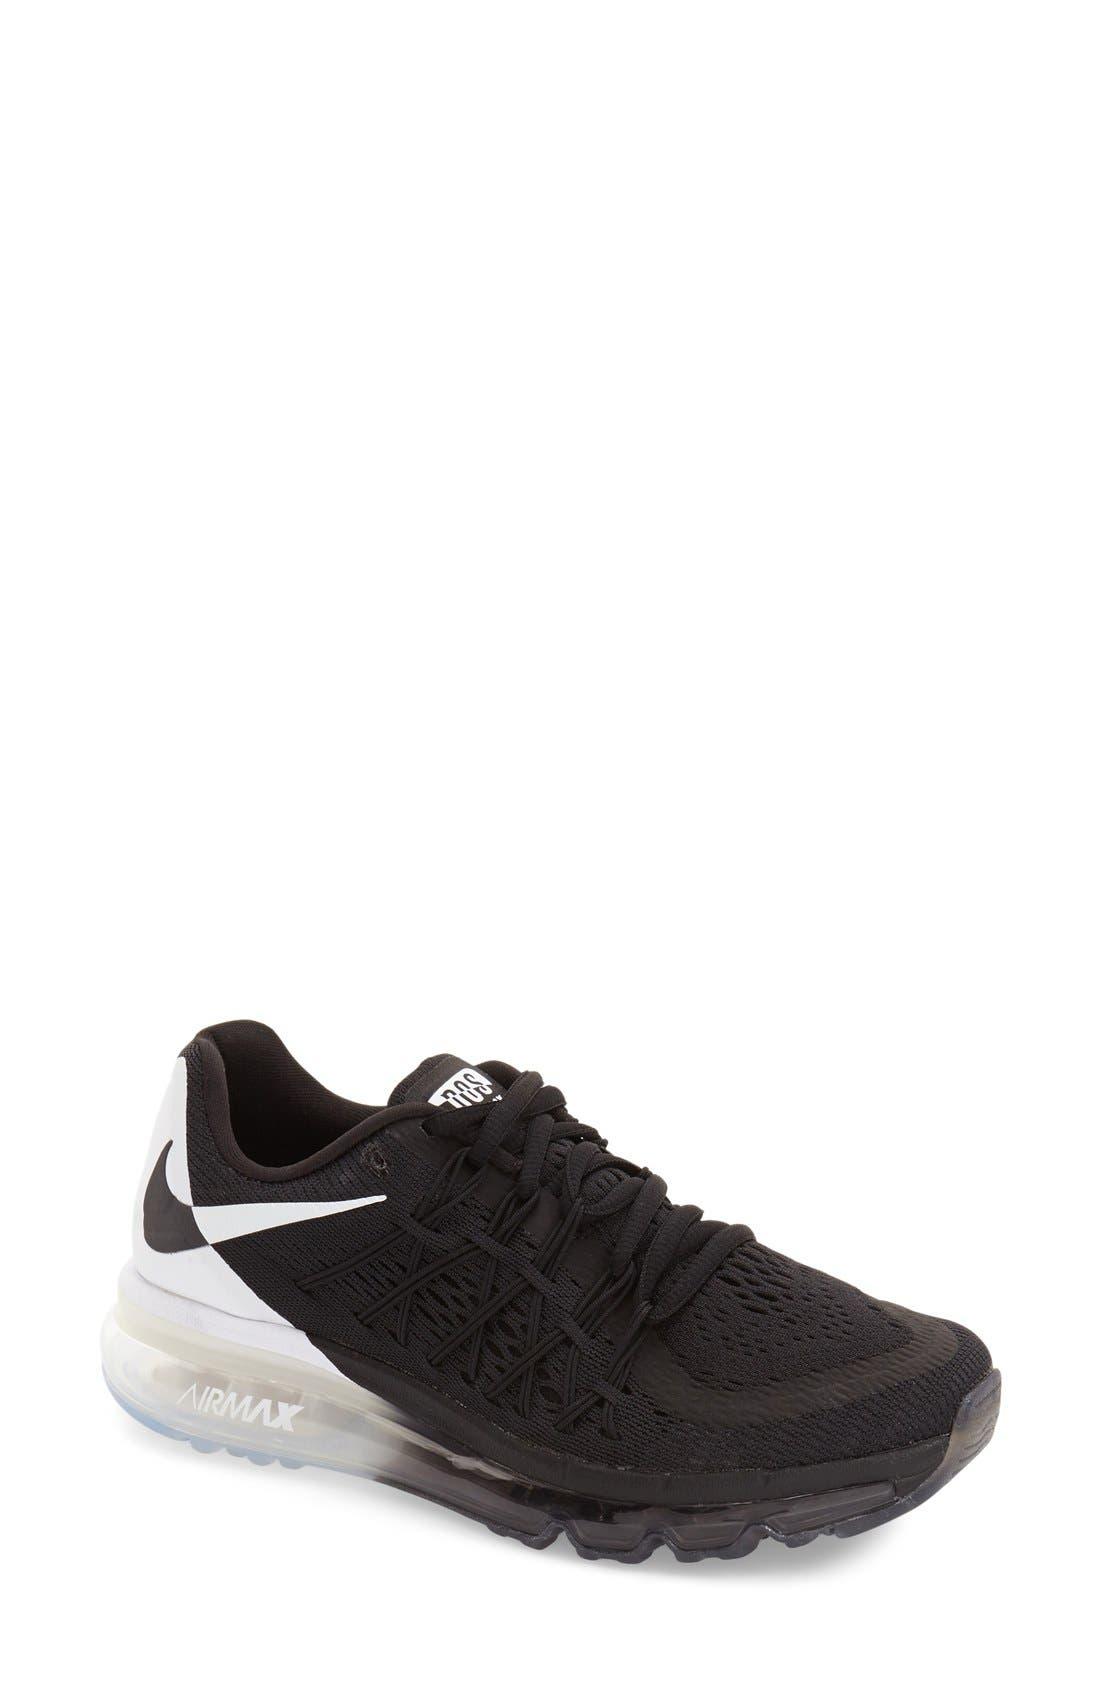 Alternate Image 1 Selected - Nike 'Air Max 2015 DOS' Running Shoe (Women)